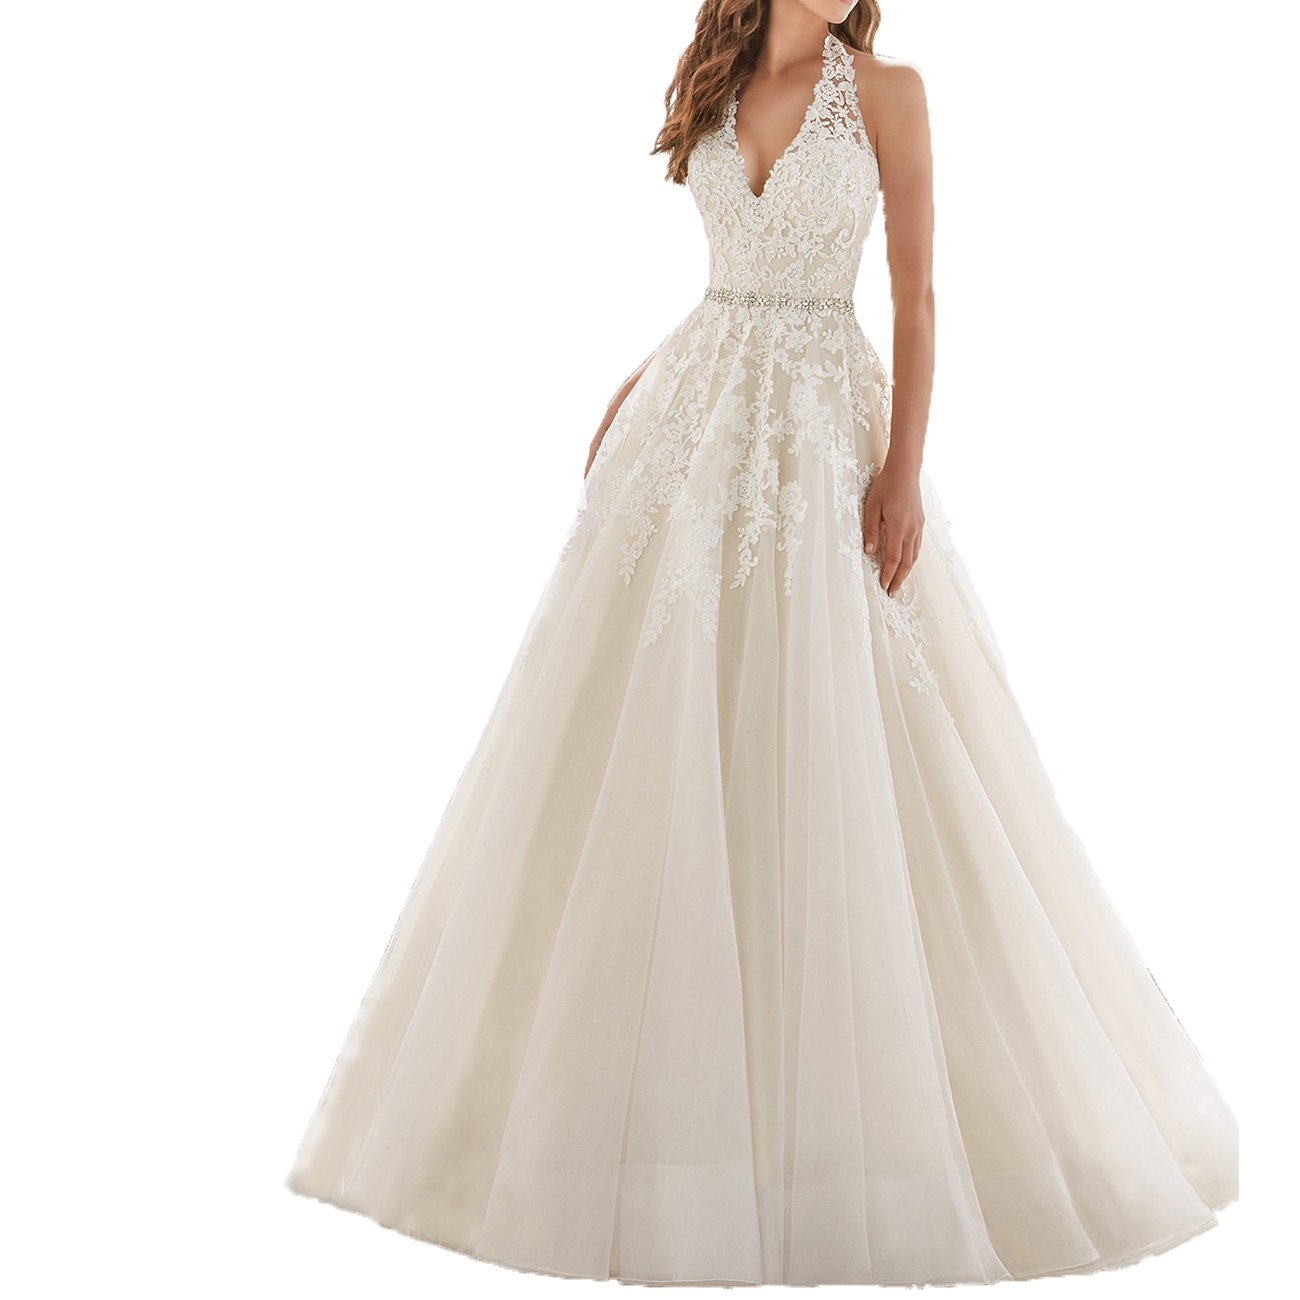 Westcorler Bridal sleeveless halter a-line wedding dress open low back chapel train (18plus, white)